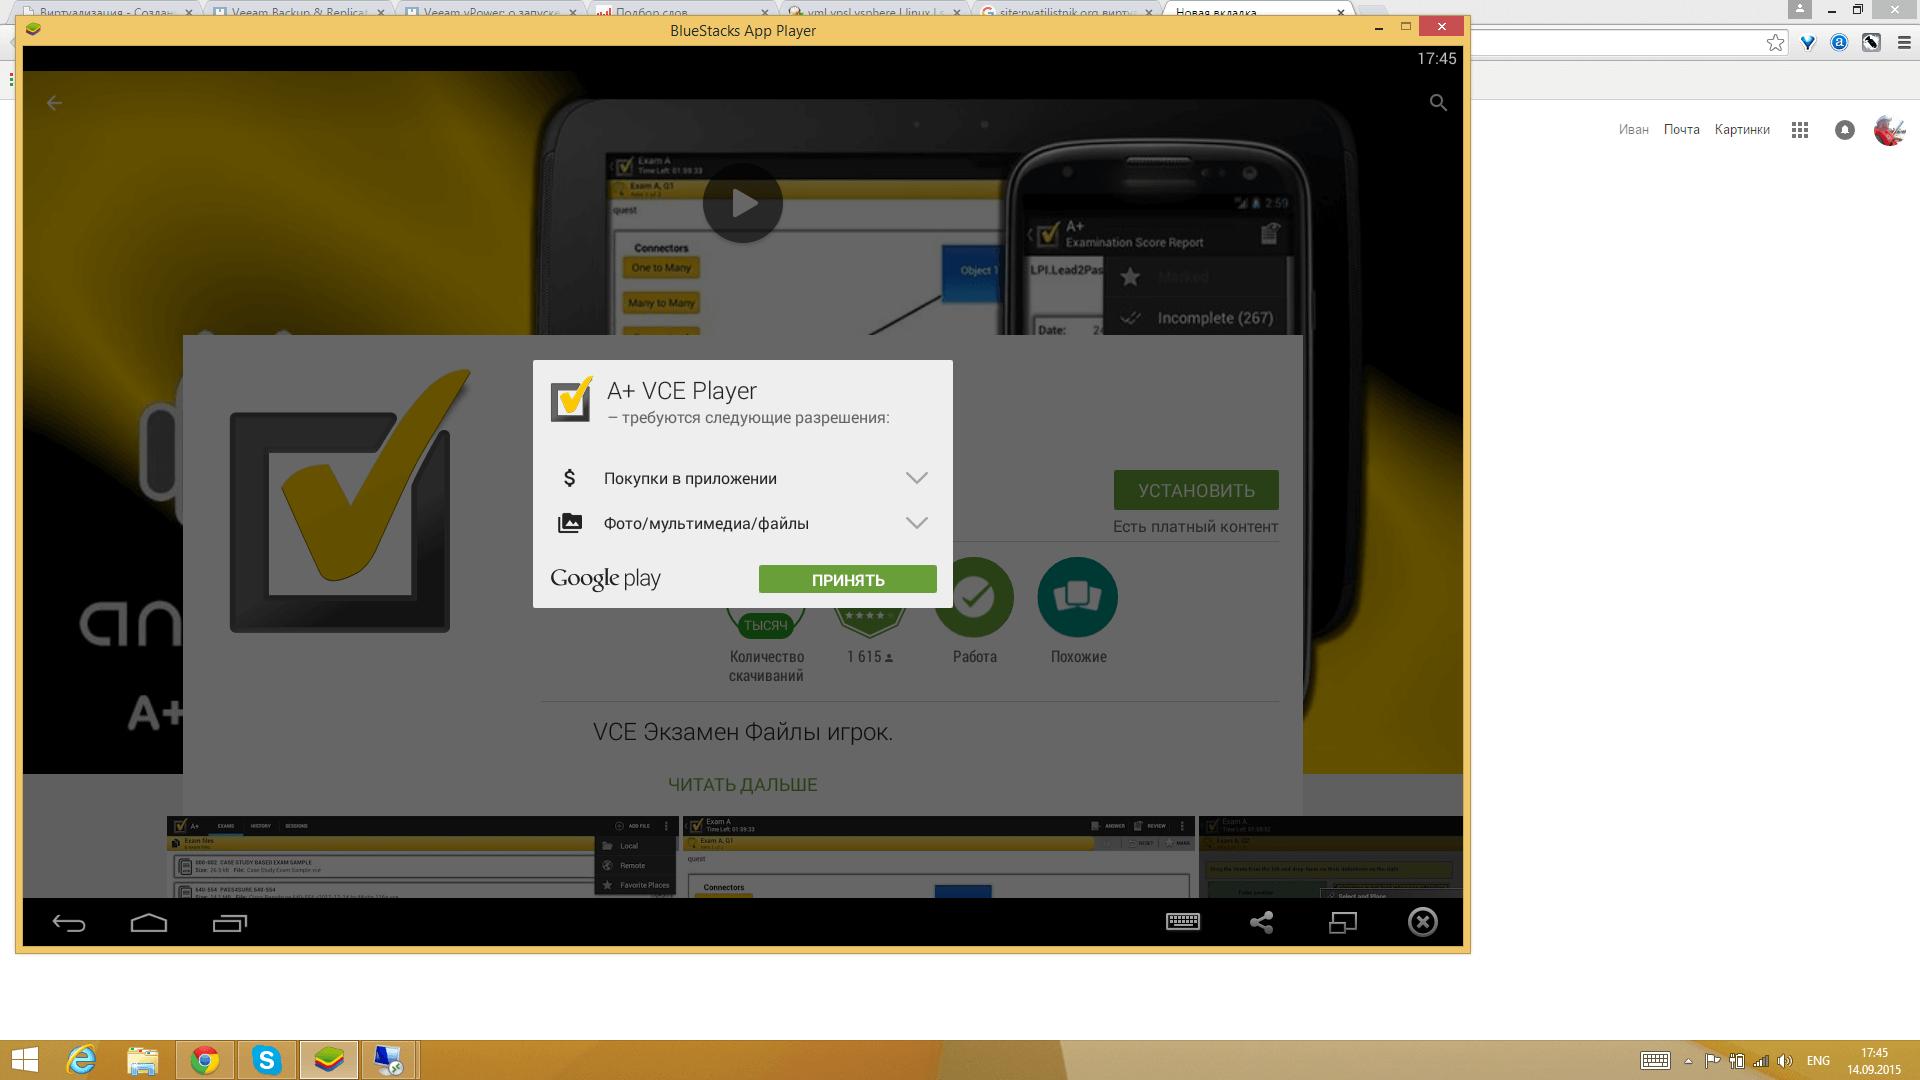 установка A+ VCE Player на эмулятор андроид